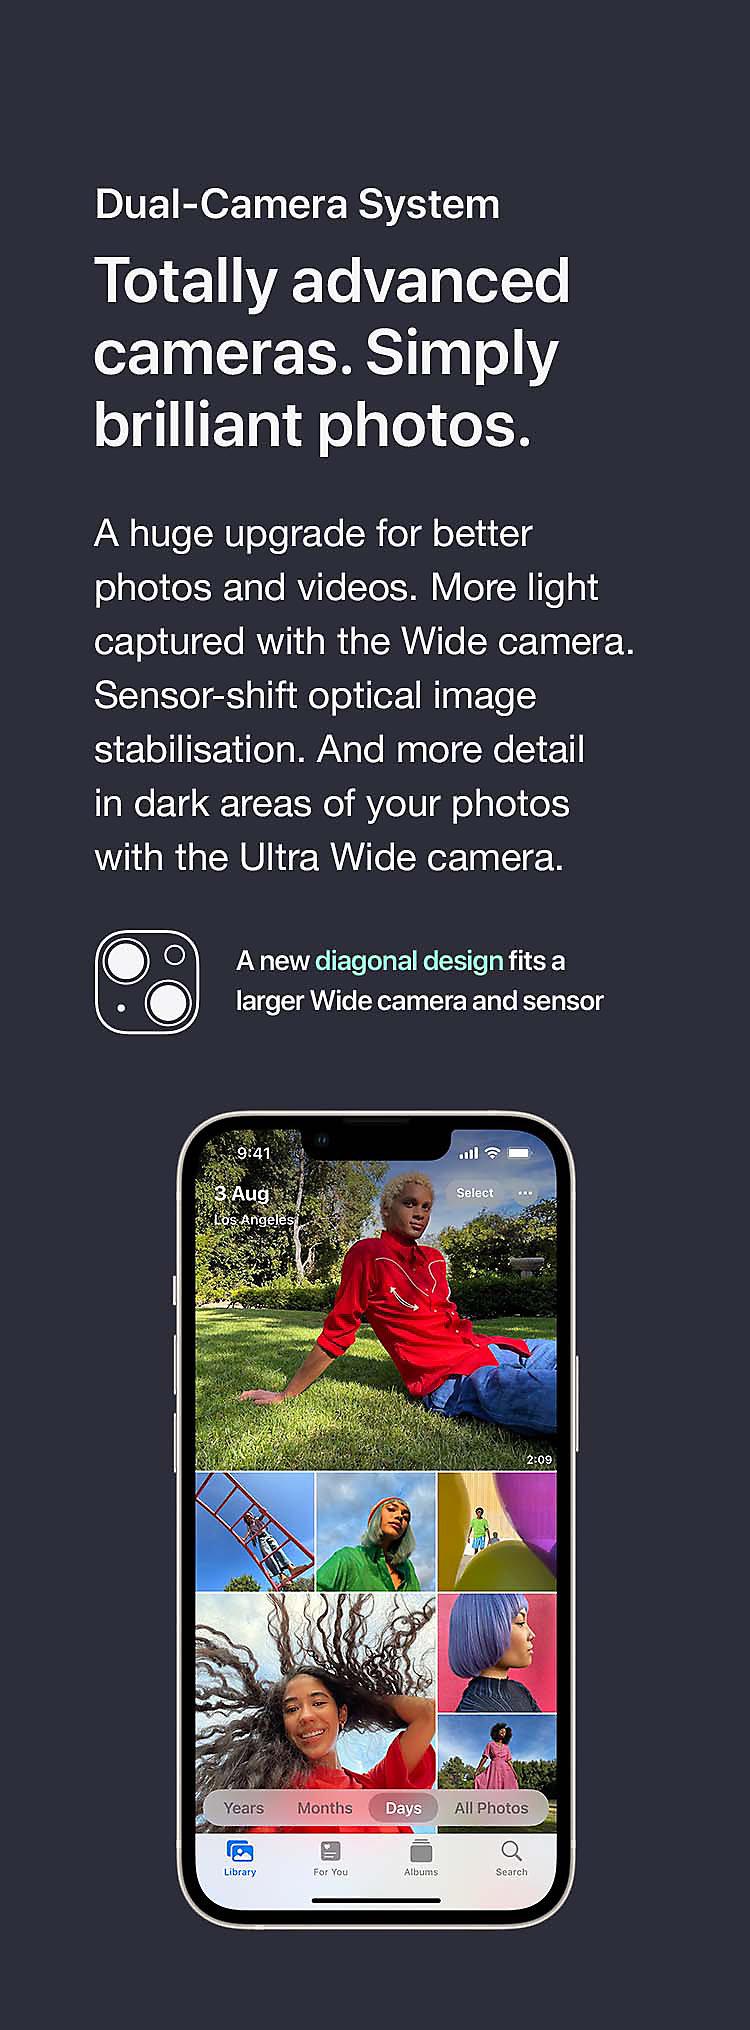 Totally advanced cameras. Simply brilliant photos.